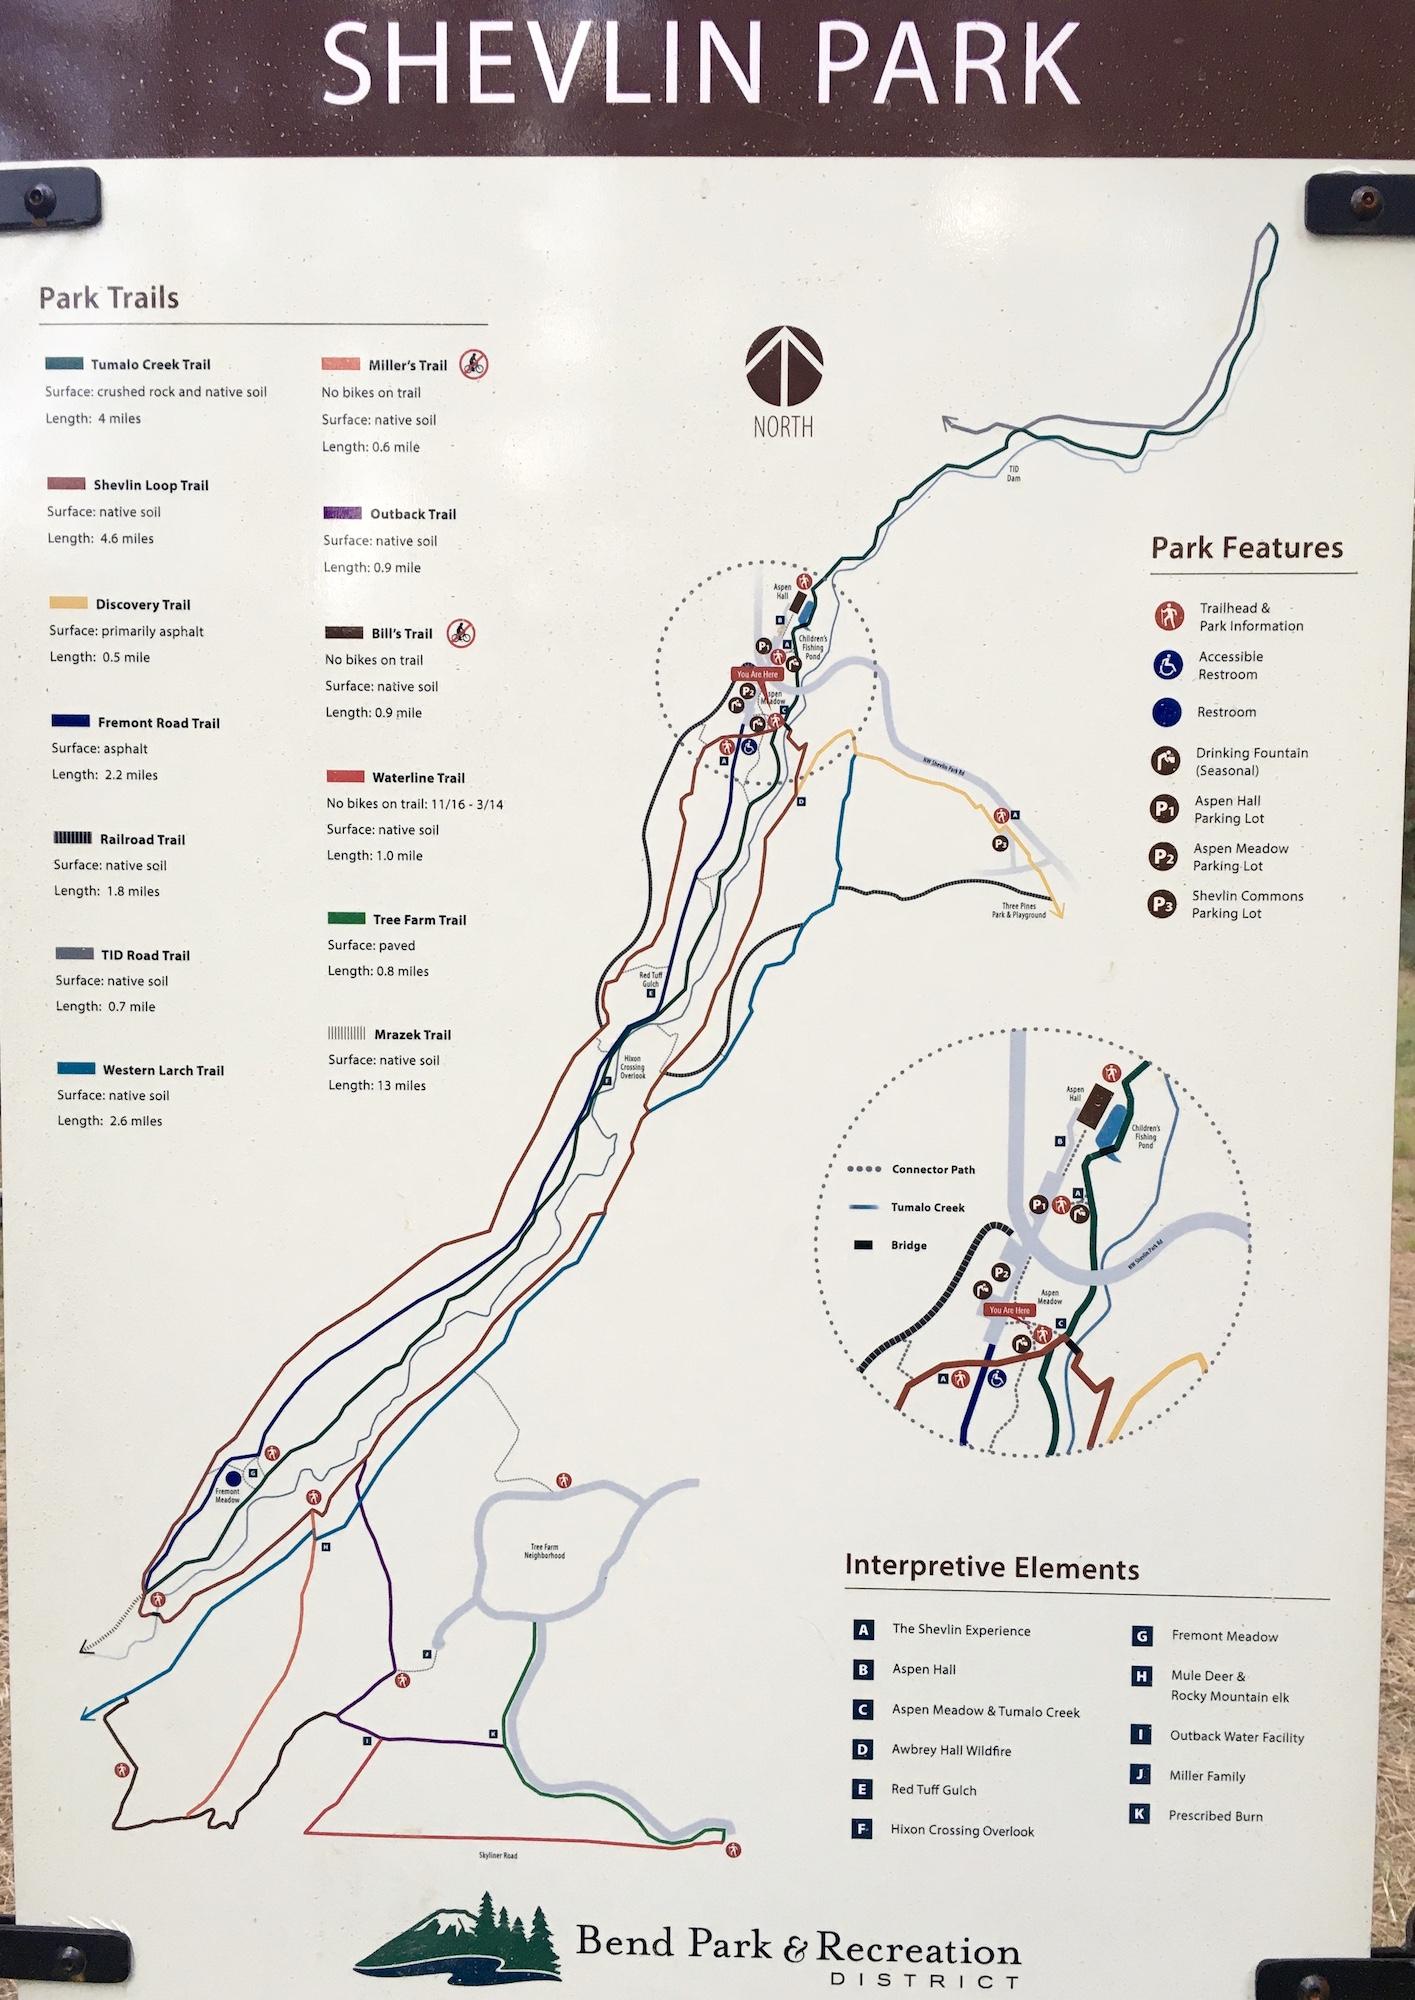 trail map of shevlin park